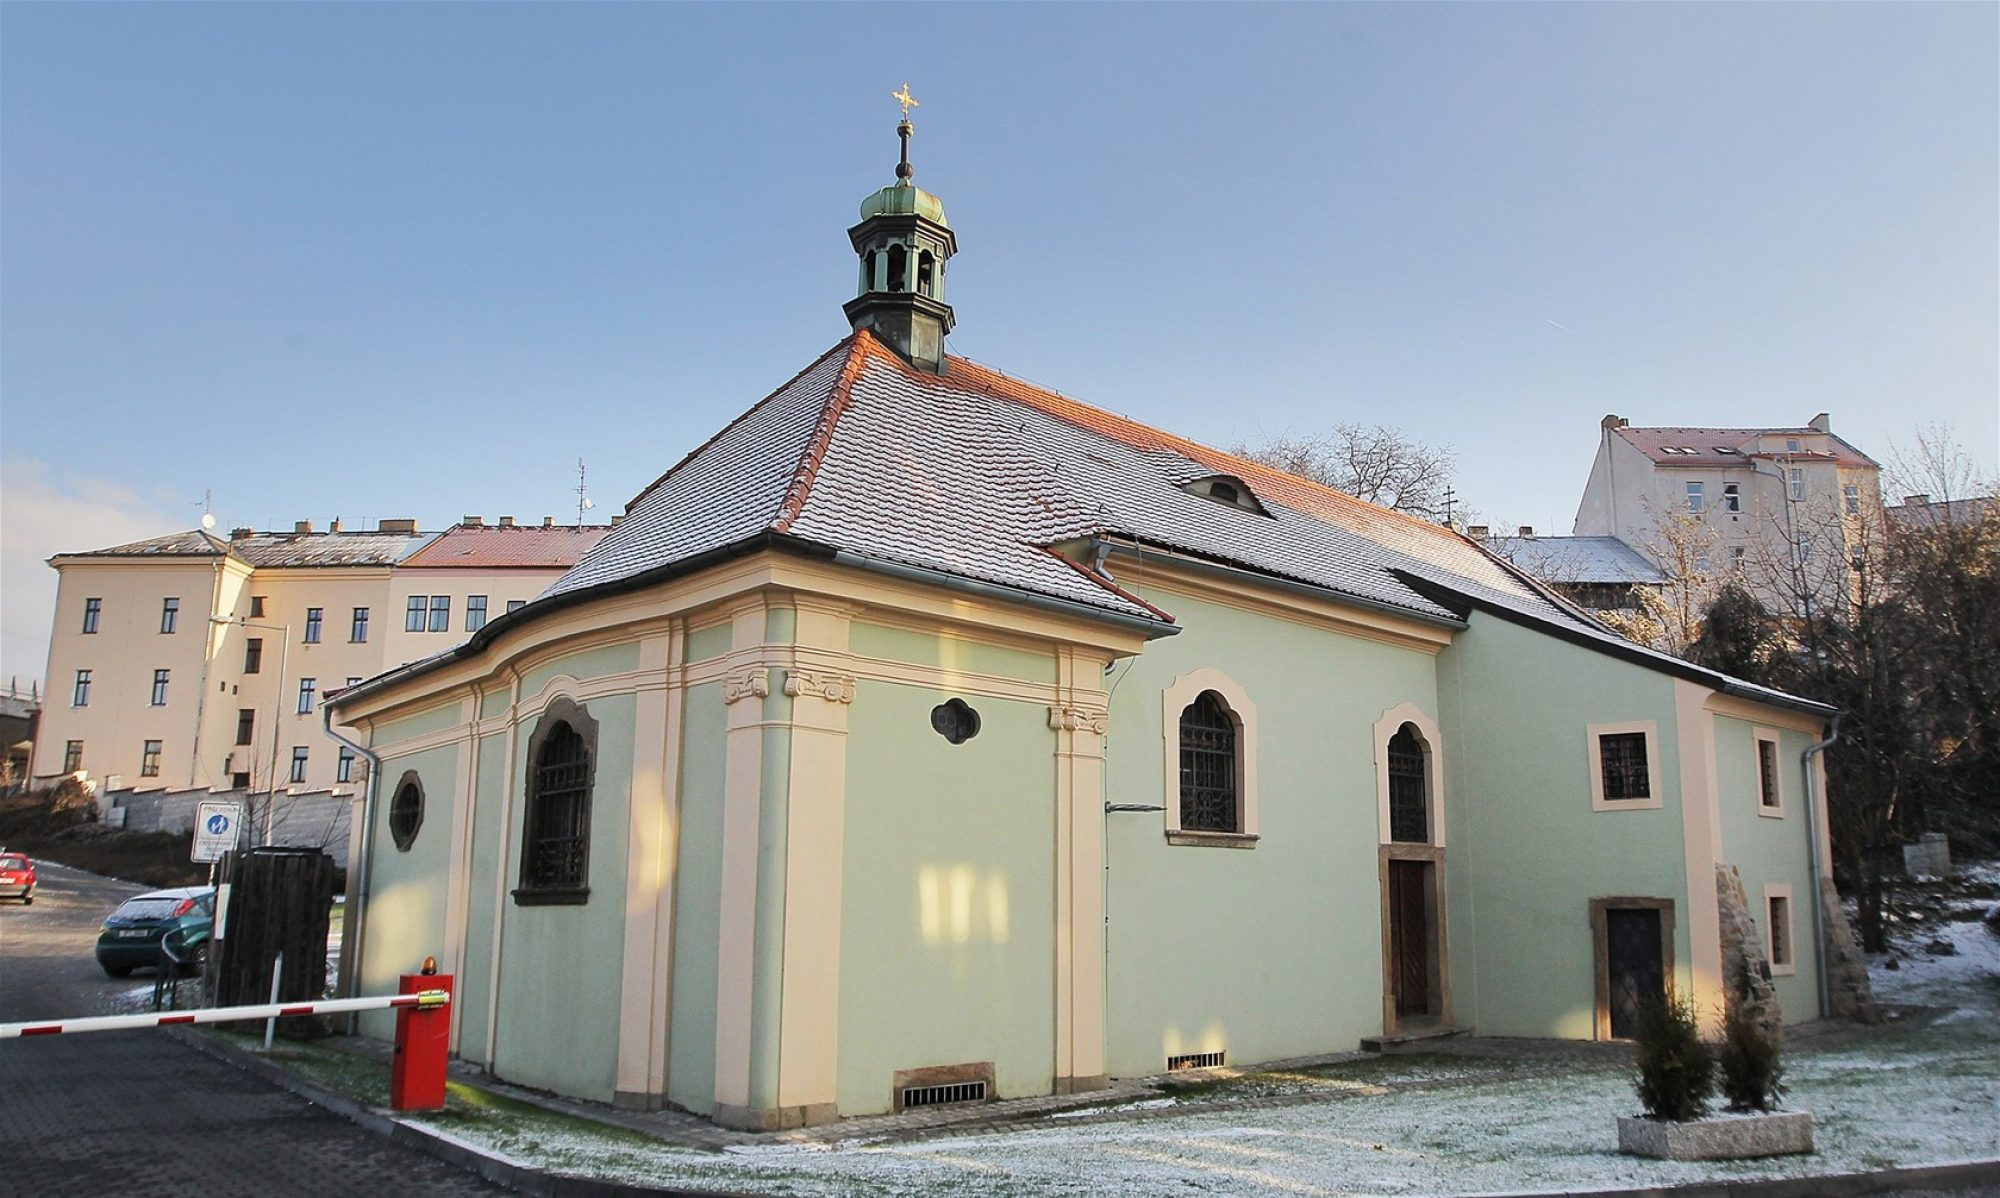 Církevní sbor ECAV v ČR v Plzni